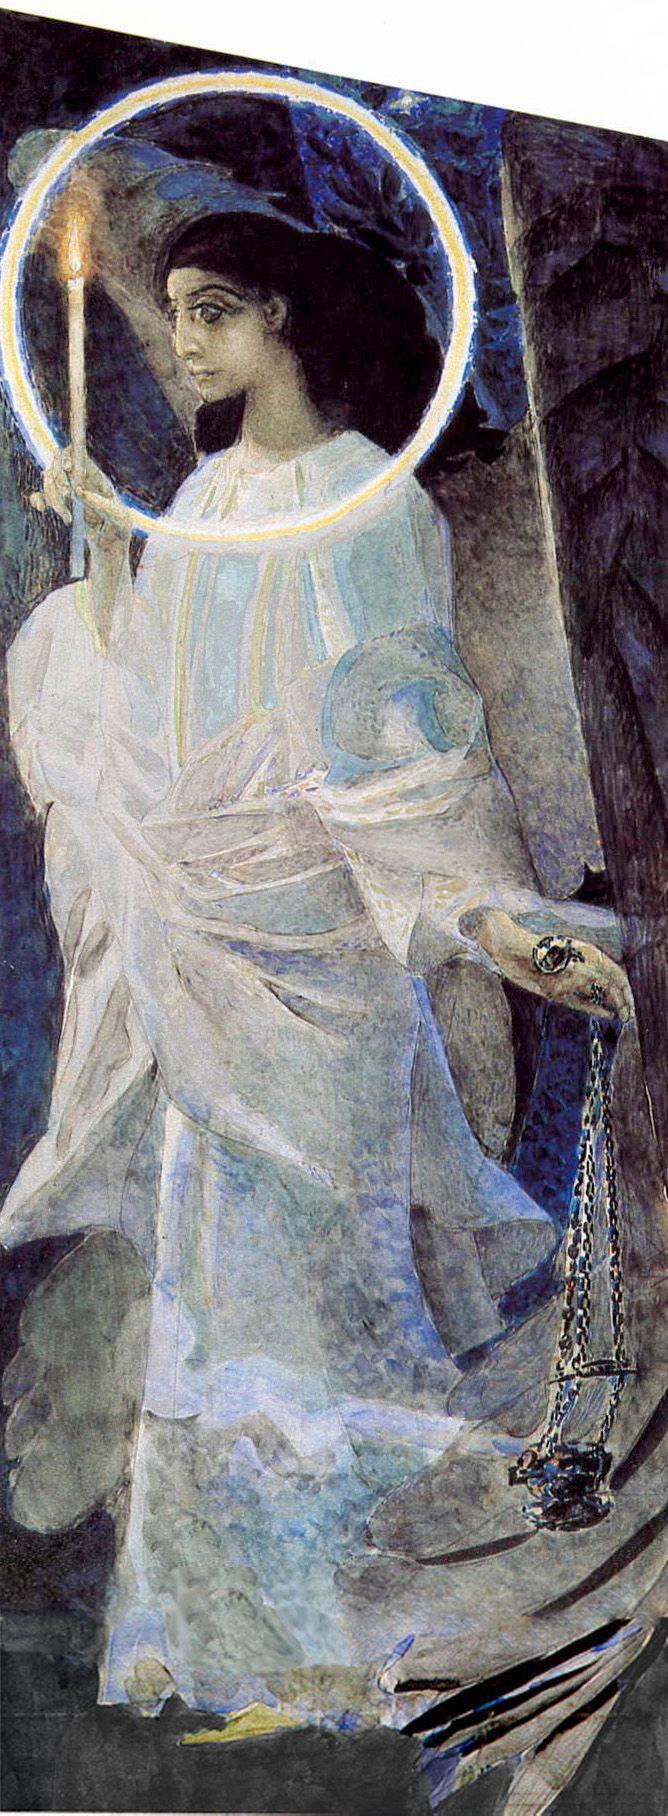 Михаил Врубель.     Ангел с кадилом и свечой.    Mikhail Vrubel.    Angel with censer and candle.